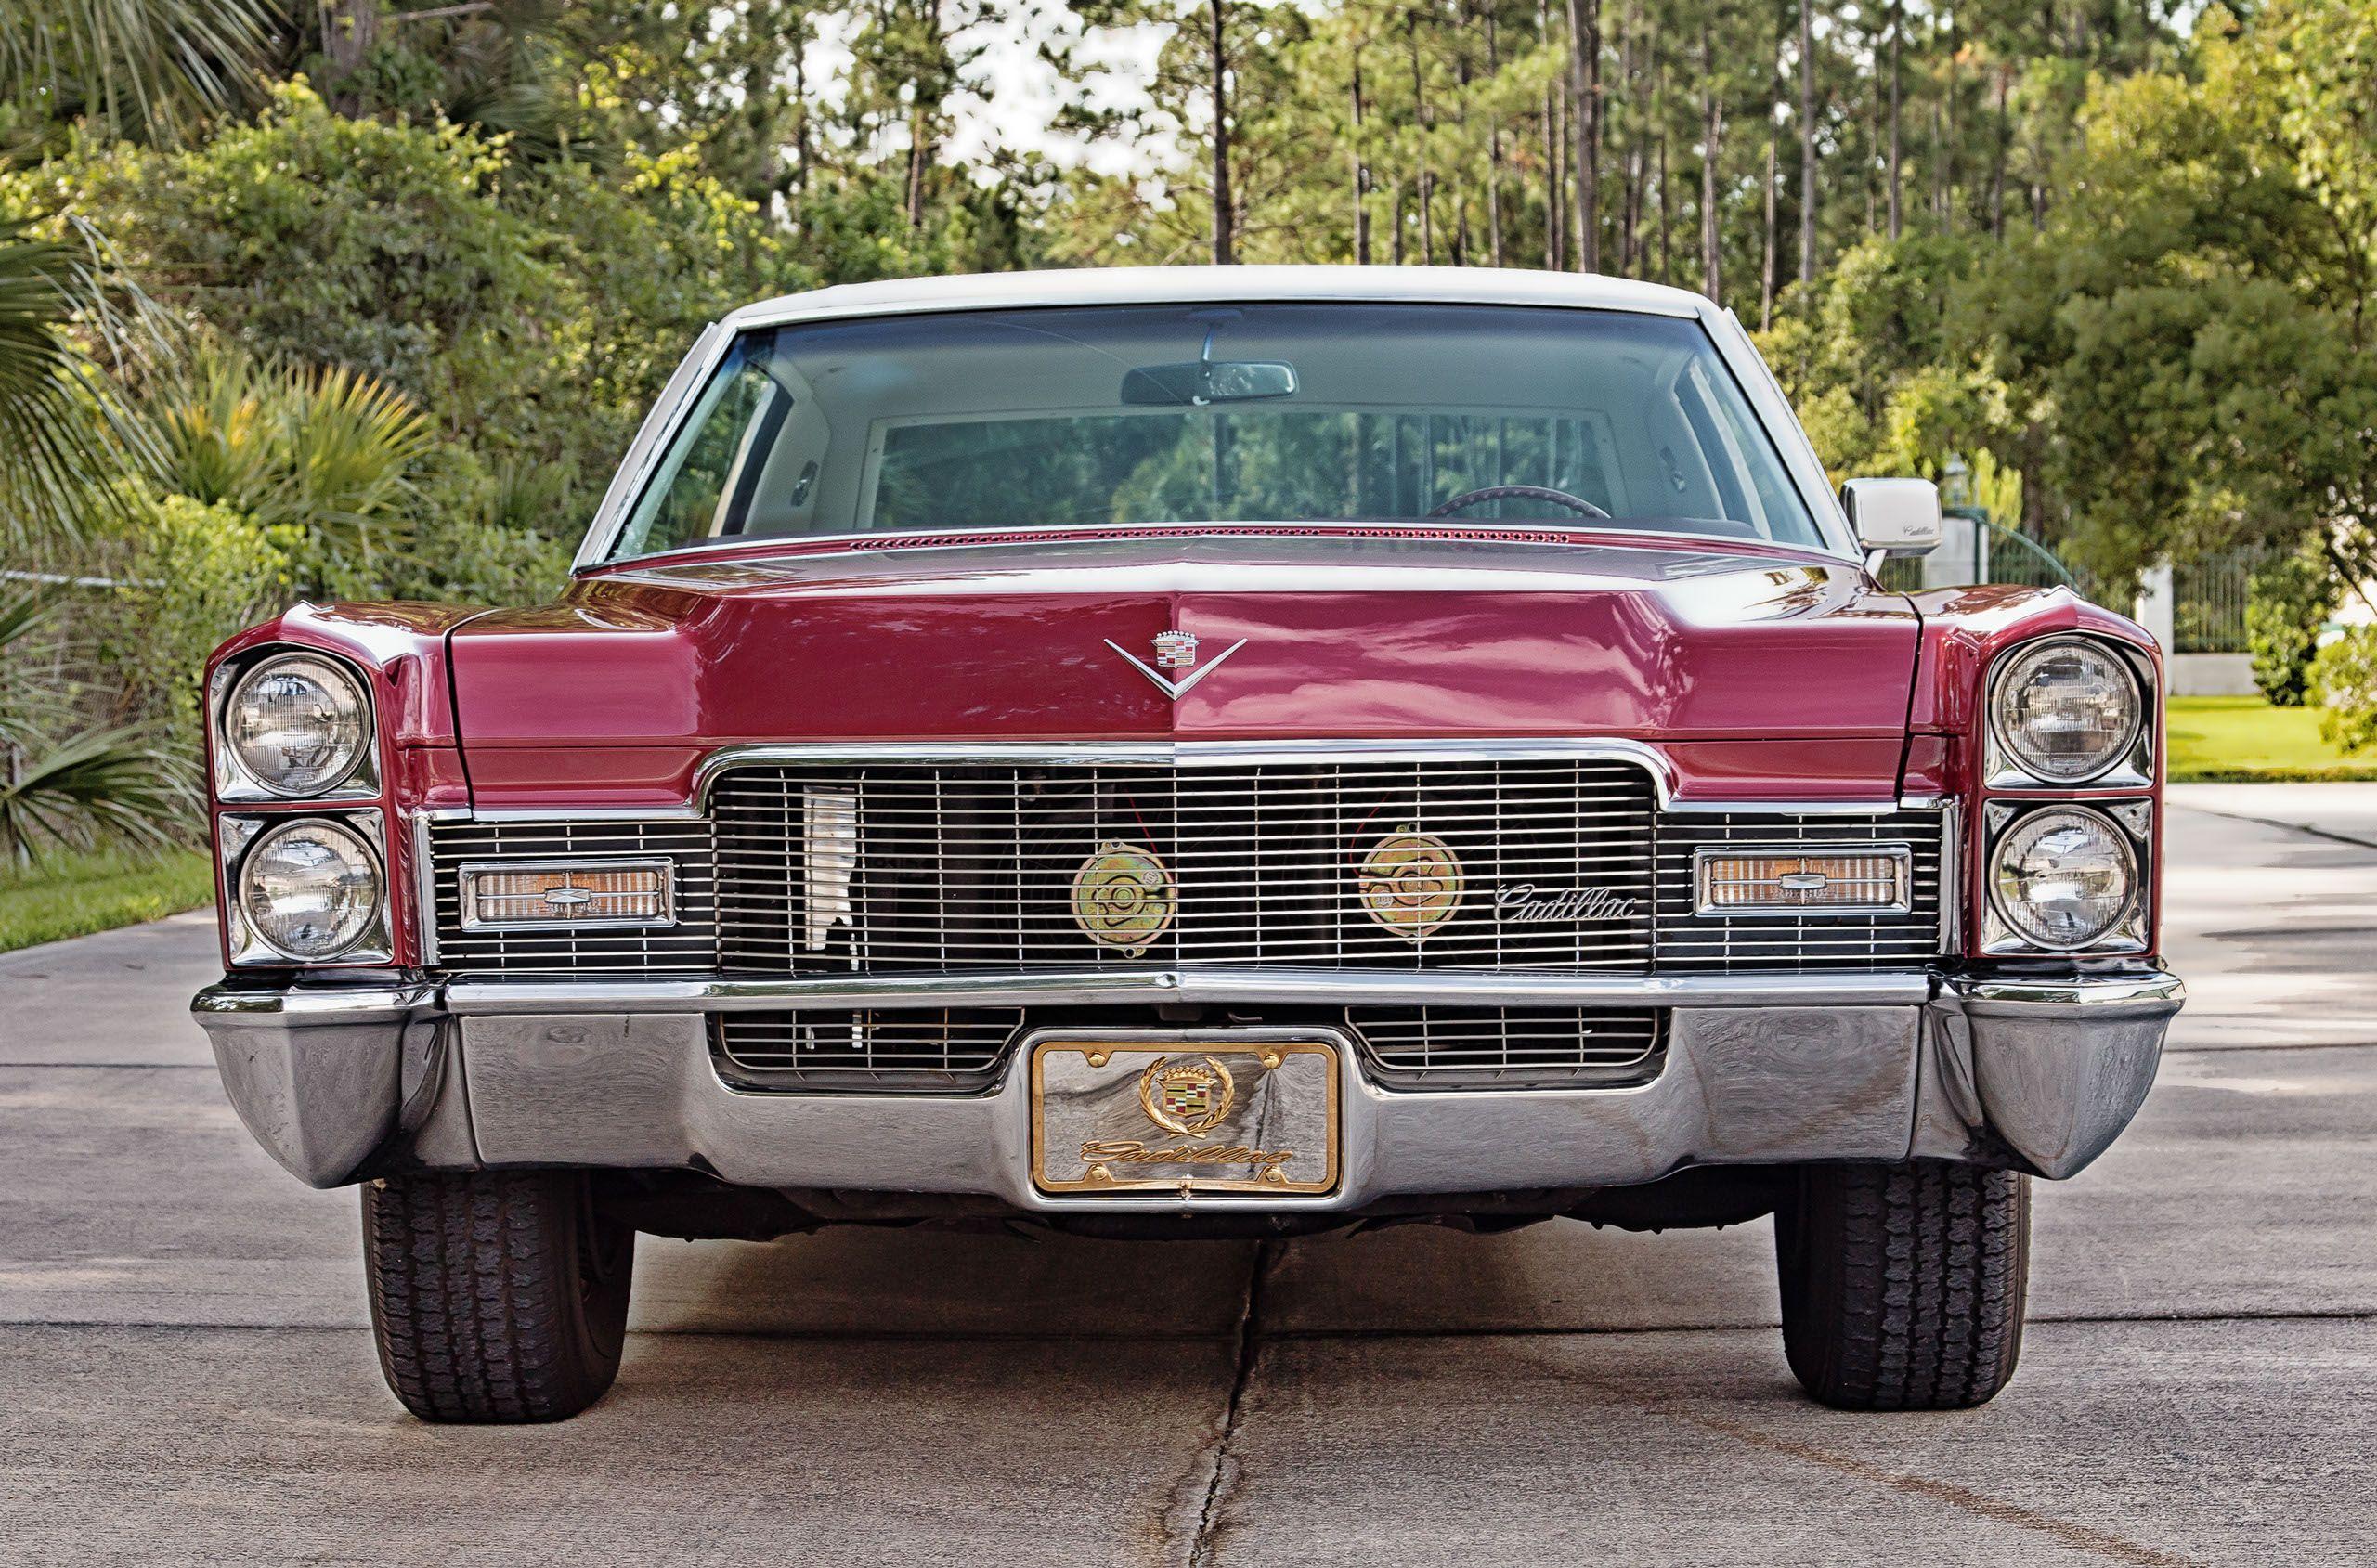 68 CADILLAC COUPE DEVILLE | Clic Cars For Sale | Pinterest ...